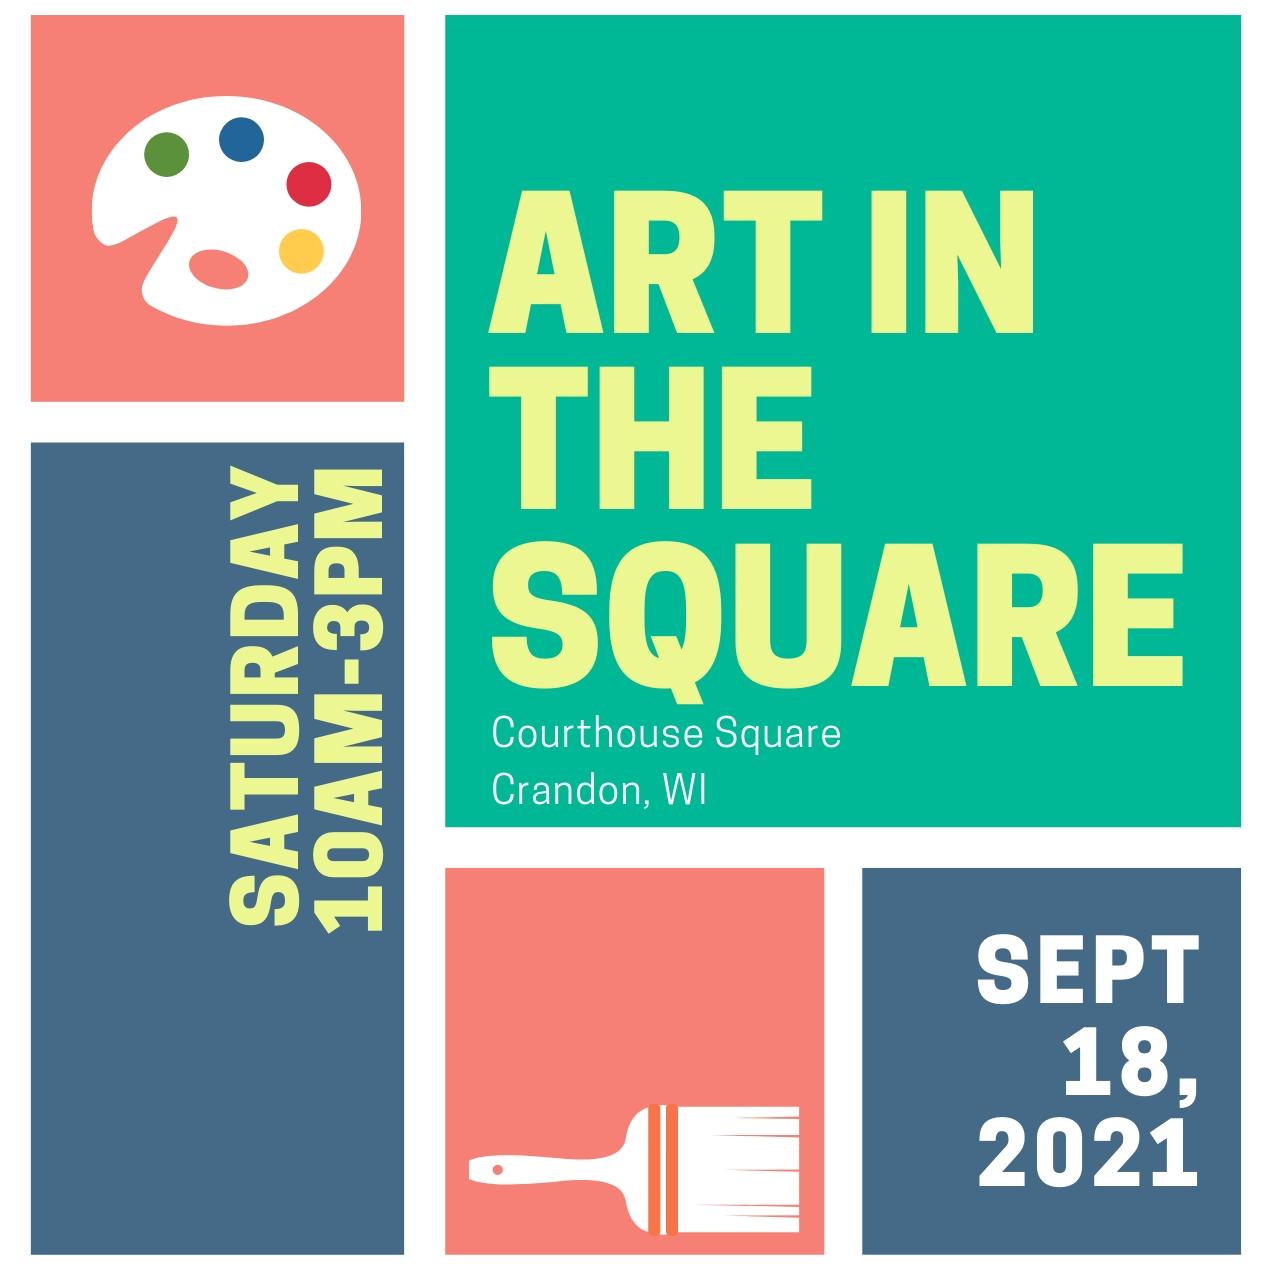 Art In The Square [September 18, 2021 10:00 Am - September 18, 2021 3:00 Pm] - Event Registration September 2021 Events